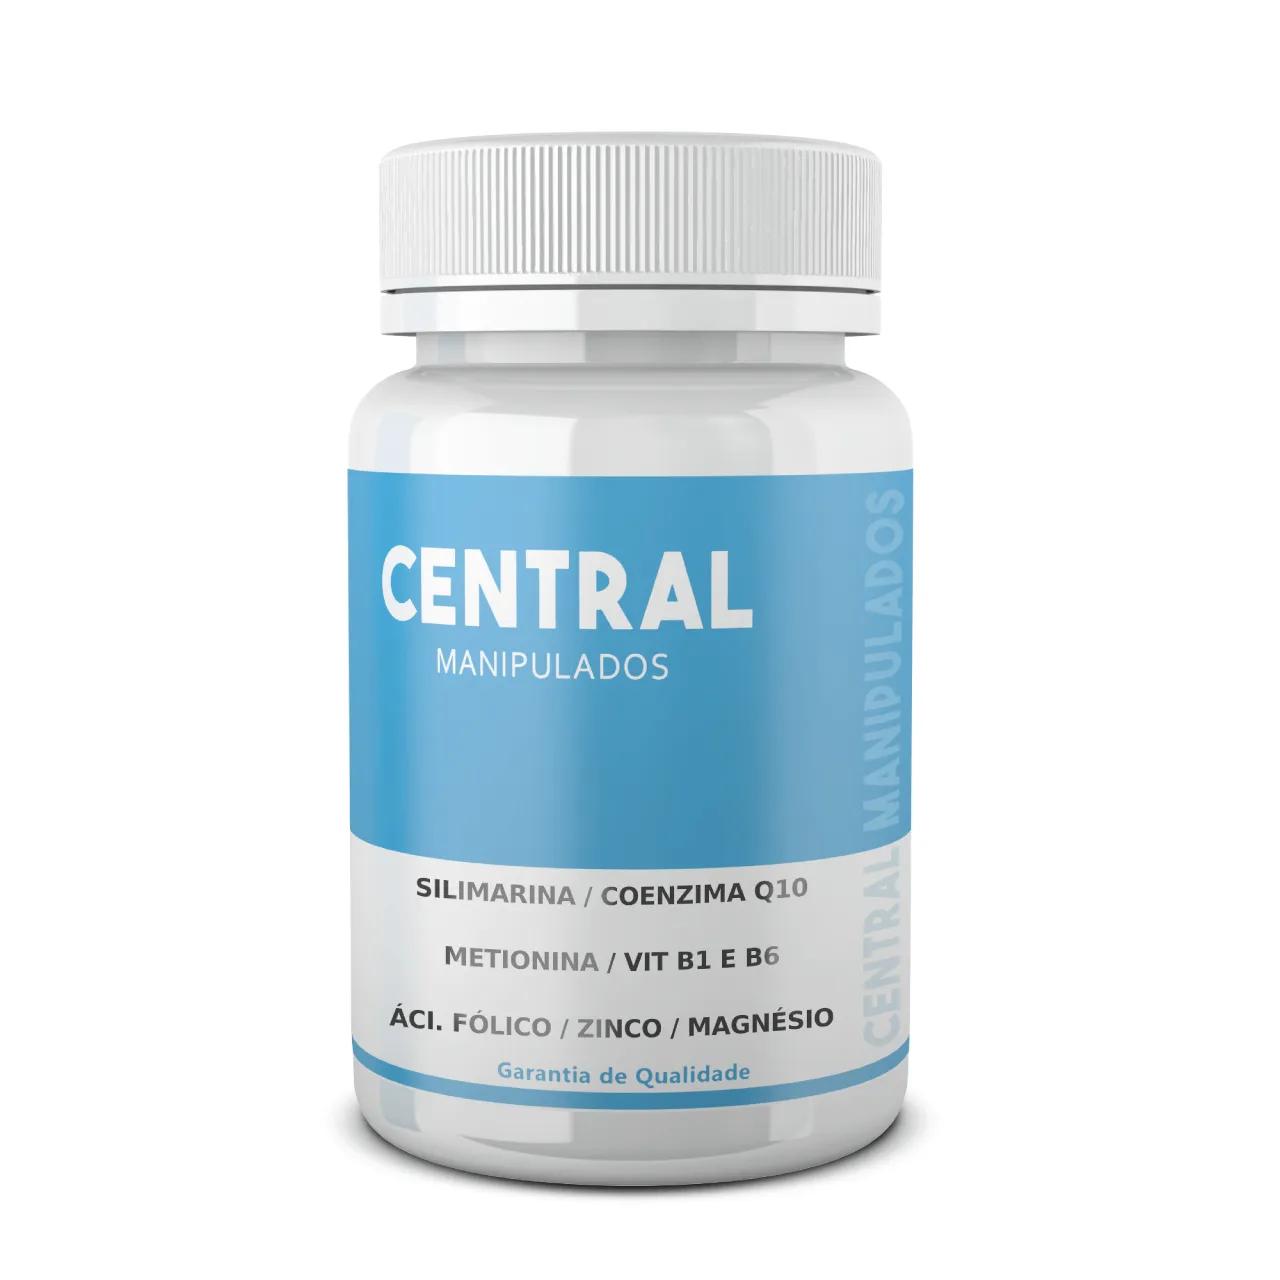 Silimarina 200mg + Coenzima Q10 Ubiquinona 50mg + Metionina 100mg +  VitaminaB1 5mg + B6 10mg + Ácido Fólico 1mg + Zinco 10mg + Magnésio 115mg - 30 cápsulas